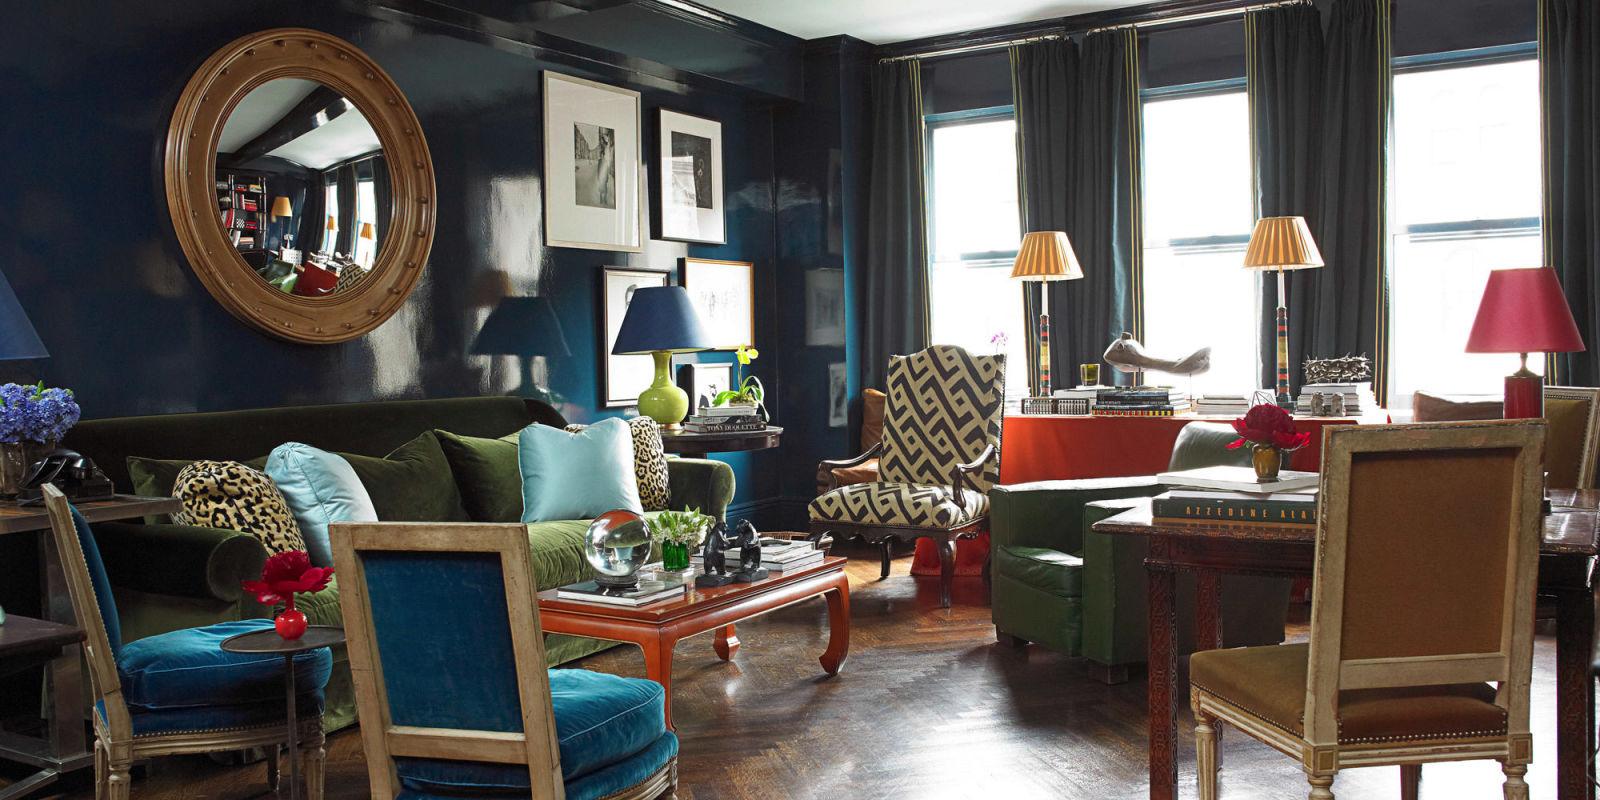 20 Something Manhattan Apartment: Miles Redd's Colorful And Intense Manhattan Design